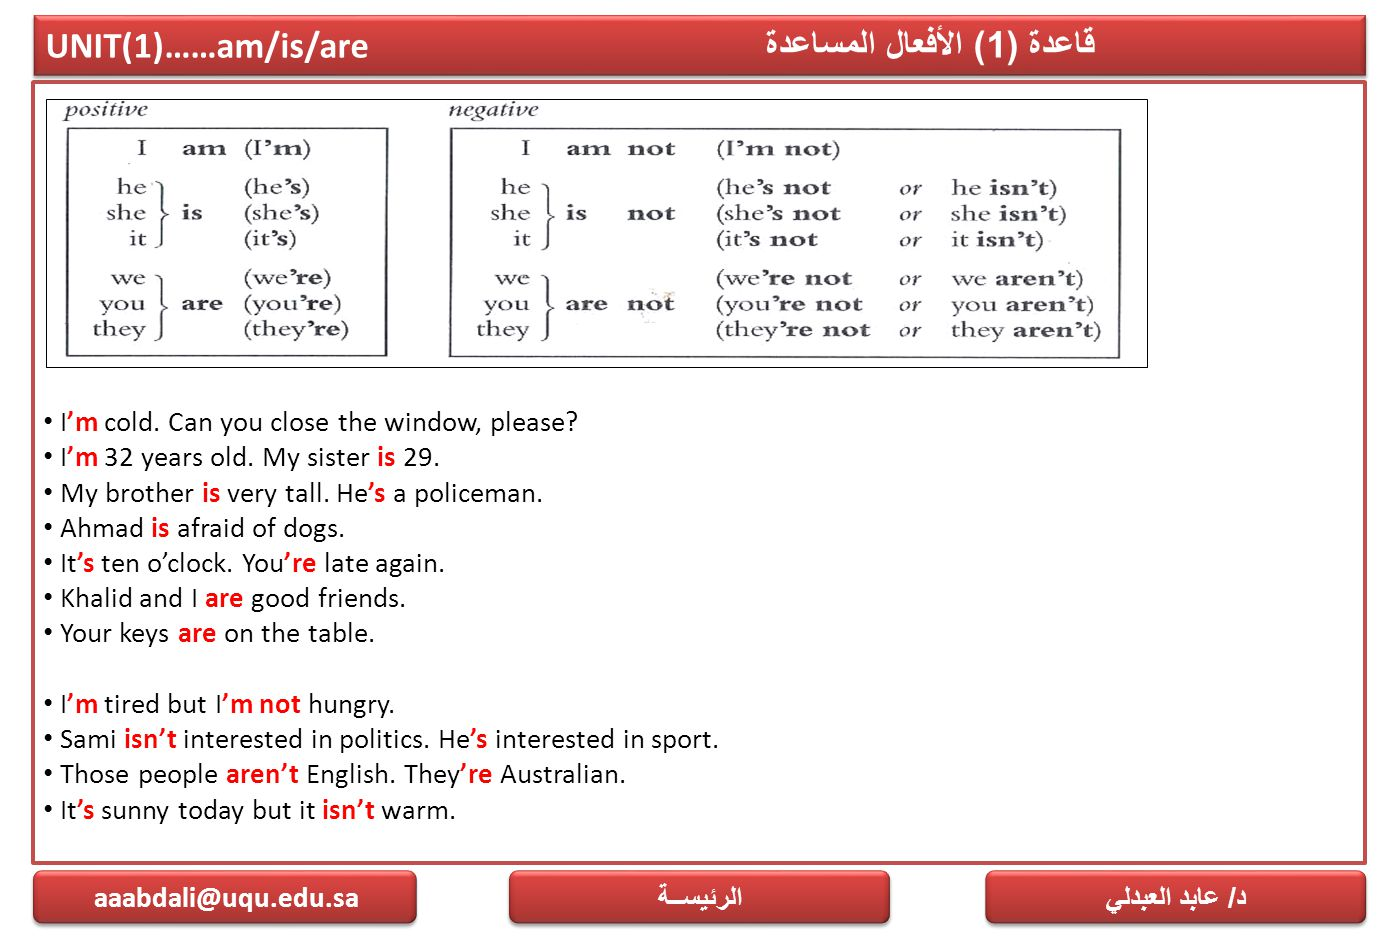 UNIT(1)……am/is/are قاعدة (1) الأفعال المساعدة